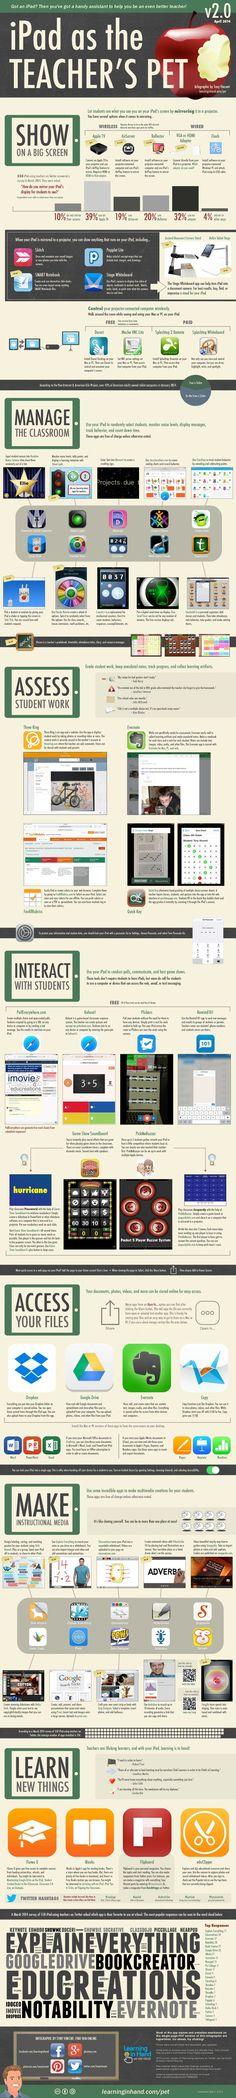 iPad as the Teacher's Pet Version 2.0 Infographic